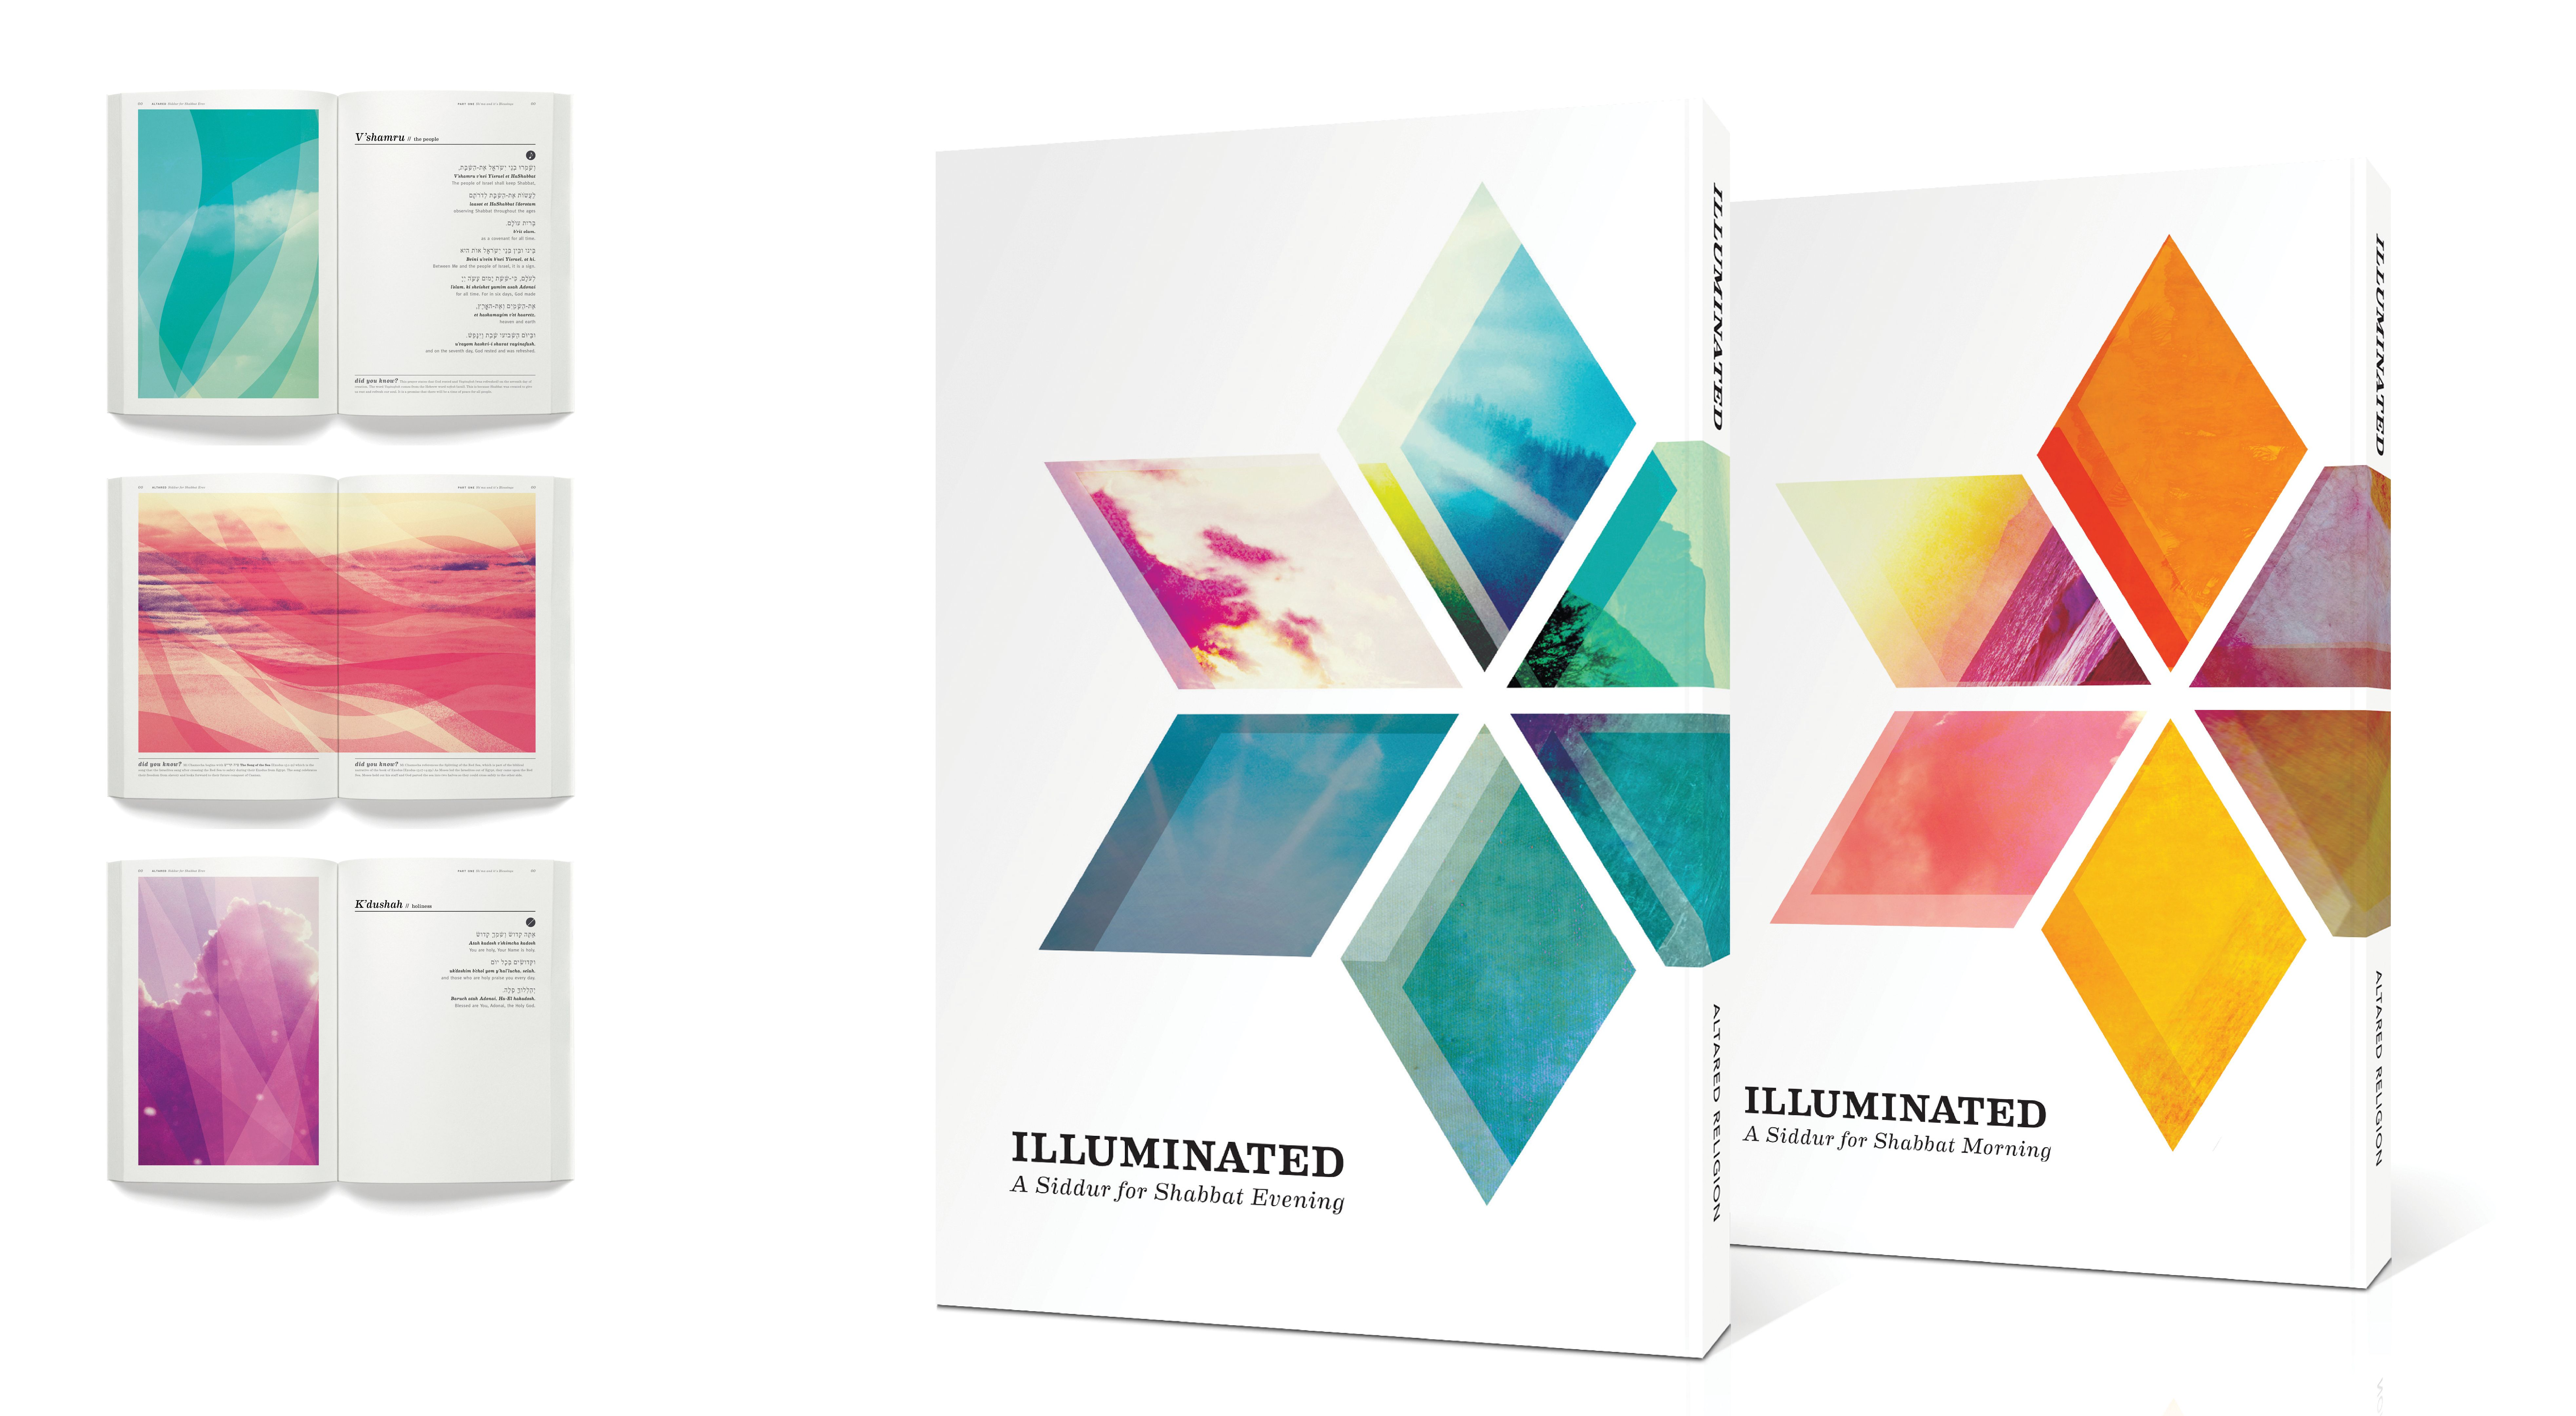 Laura Donaldson: Illuminated Thesis Project #AAU #designthesis #graphic  Design | Projects, Design, Graphic